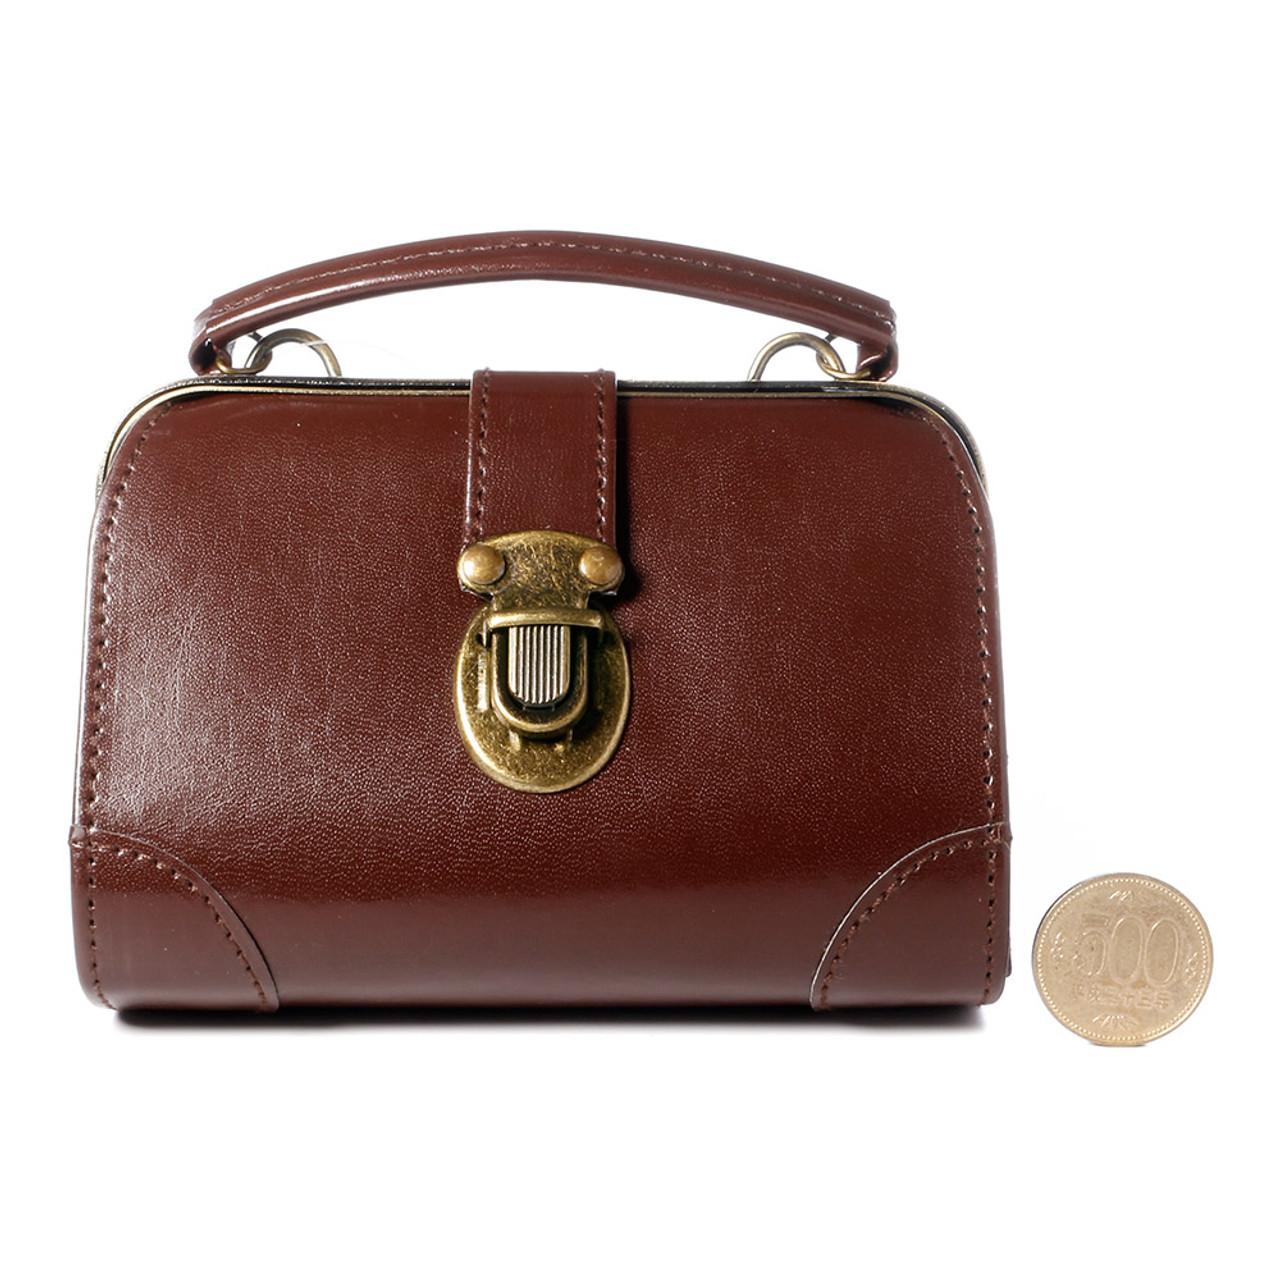 Seto Craft Motif Mini Doctor Bag Shape Pouch / Cosmetic Bag - Brown Color ( Proportion )